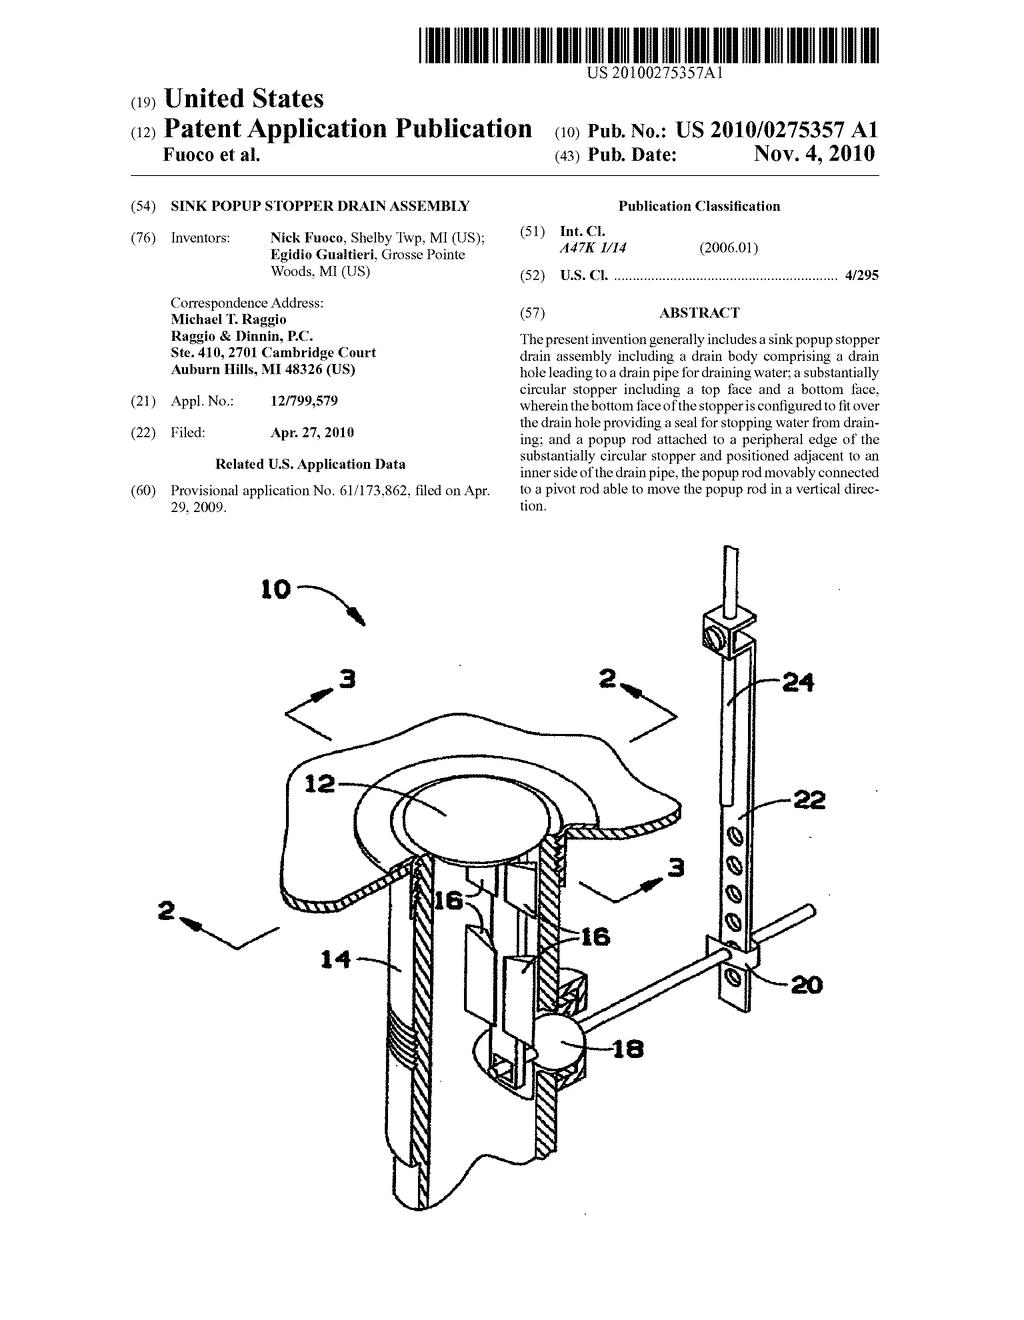 sink popup stopper drain assembly diagram schematic and image 01 rh patentsencyclopedia com sink plumbing parts diagram kitchen sink drain parts diagram